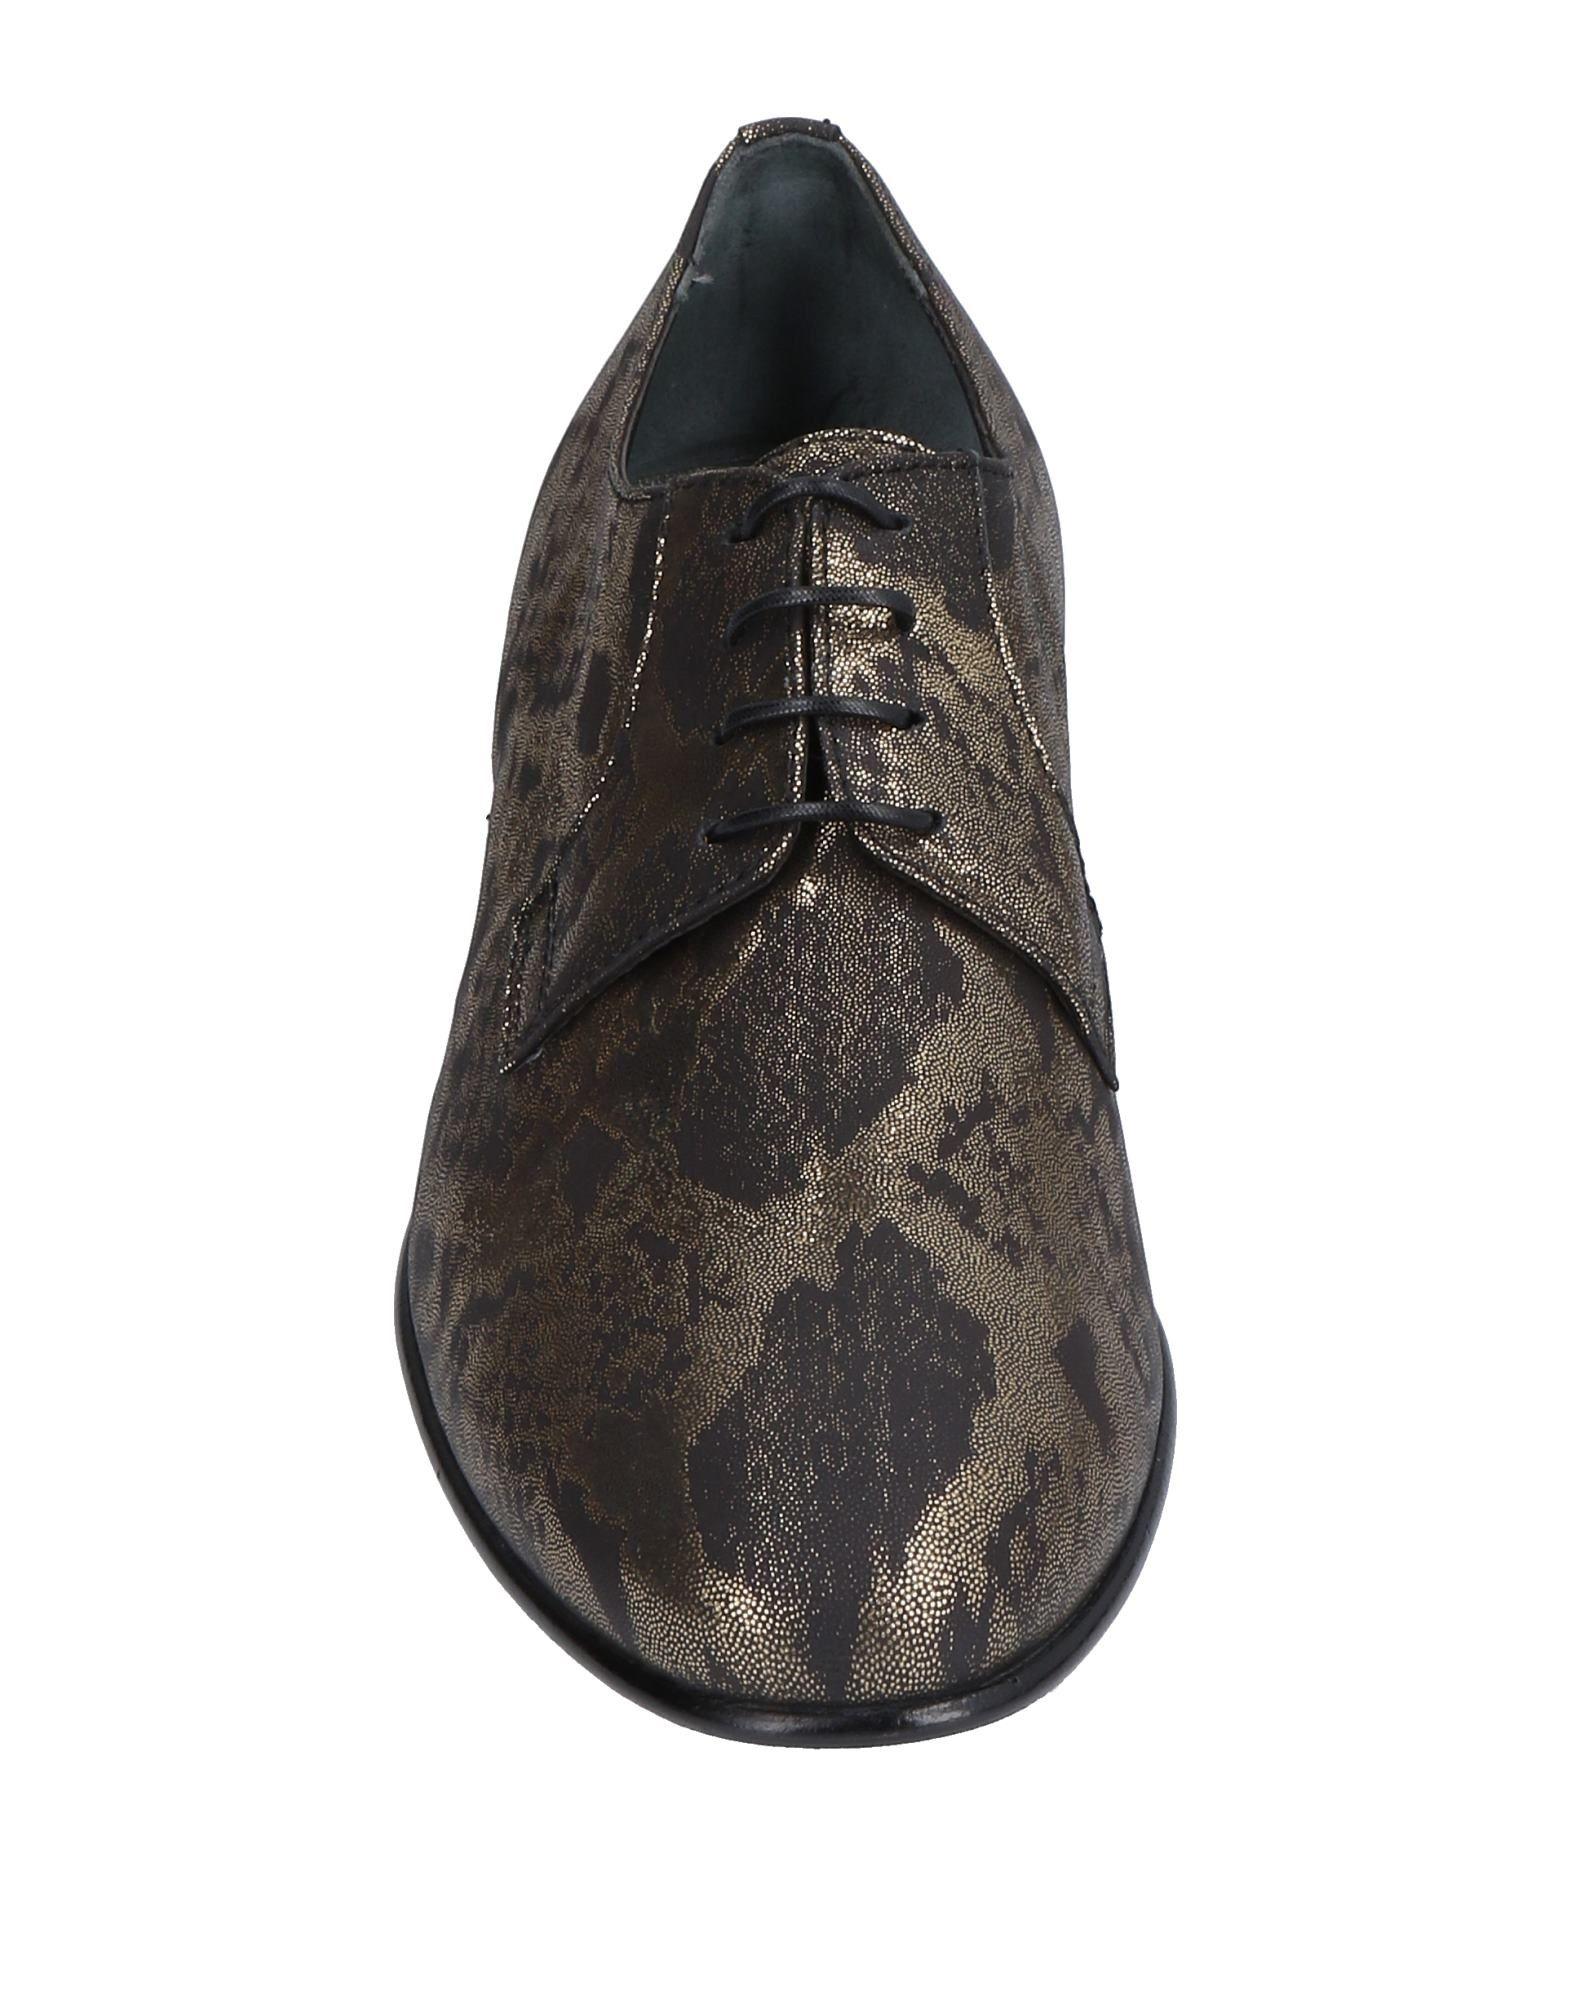 Gut Damen um billige Schuhe zu tragenGiovanni Conti Schnürschuhe Damen Gut 11520066KR a0568f